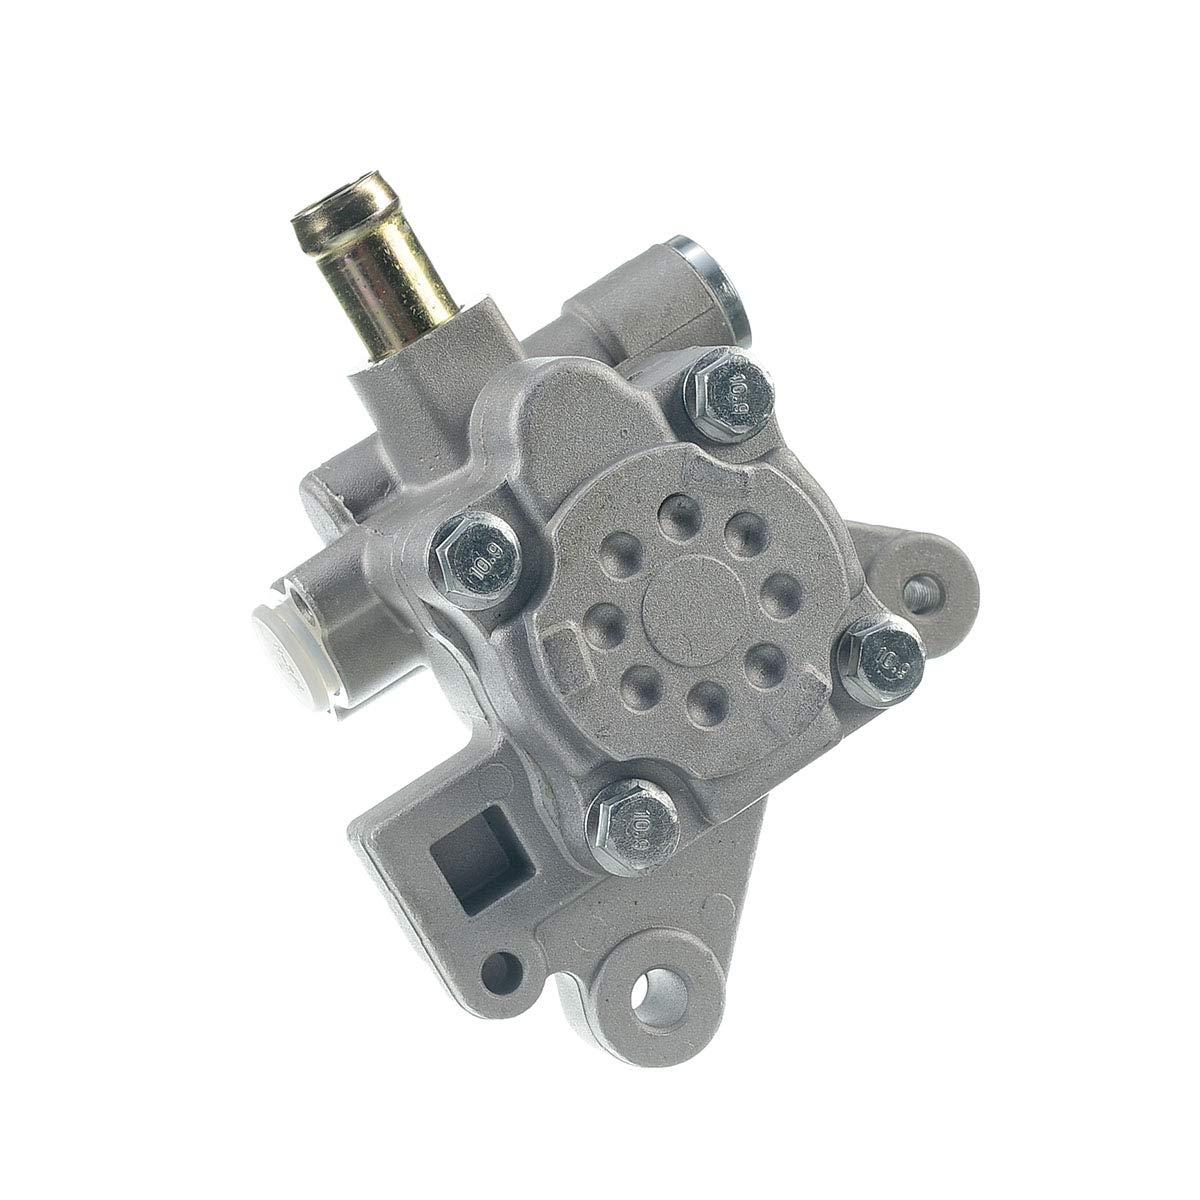 Power Steering Pump for 1998-2002 Honda Accord l4 2.3L